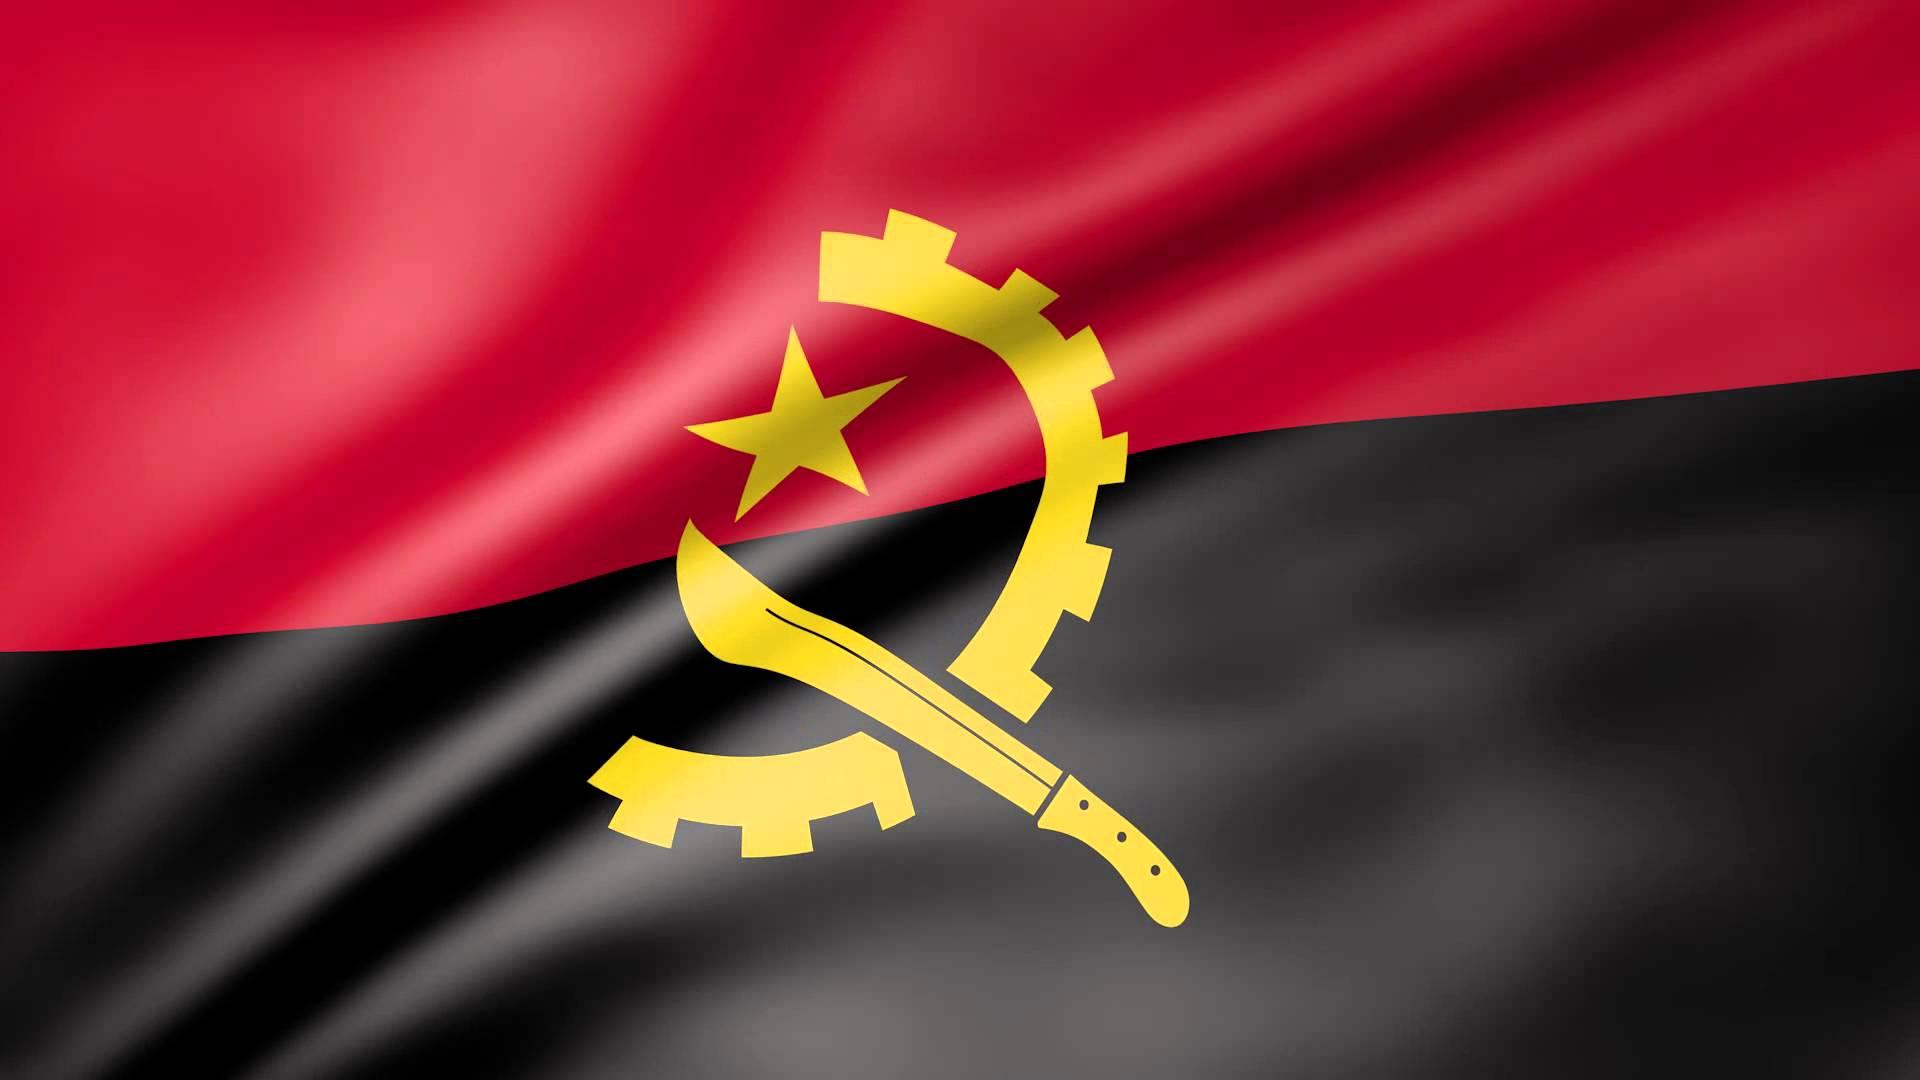 High Resolution Wallpaper | Flag Of Angola 1920x1080 px